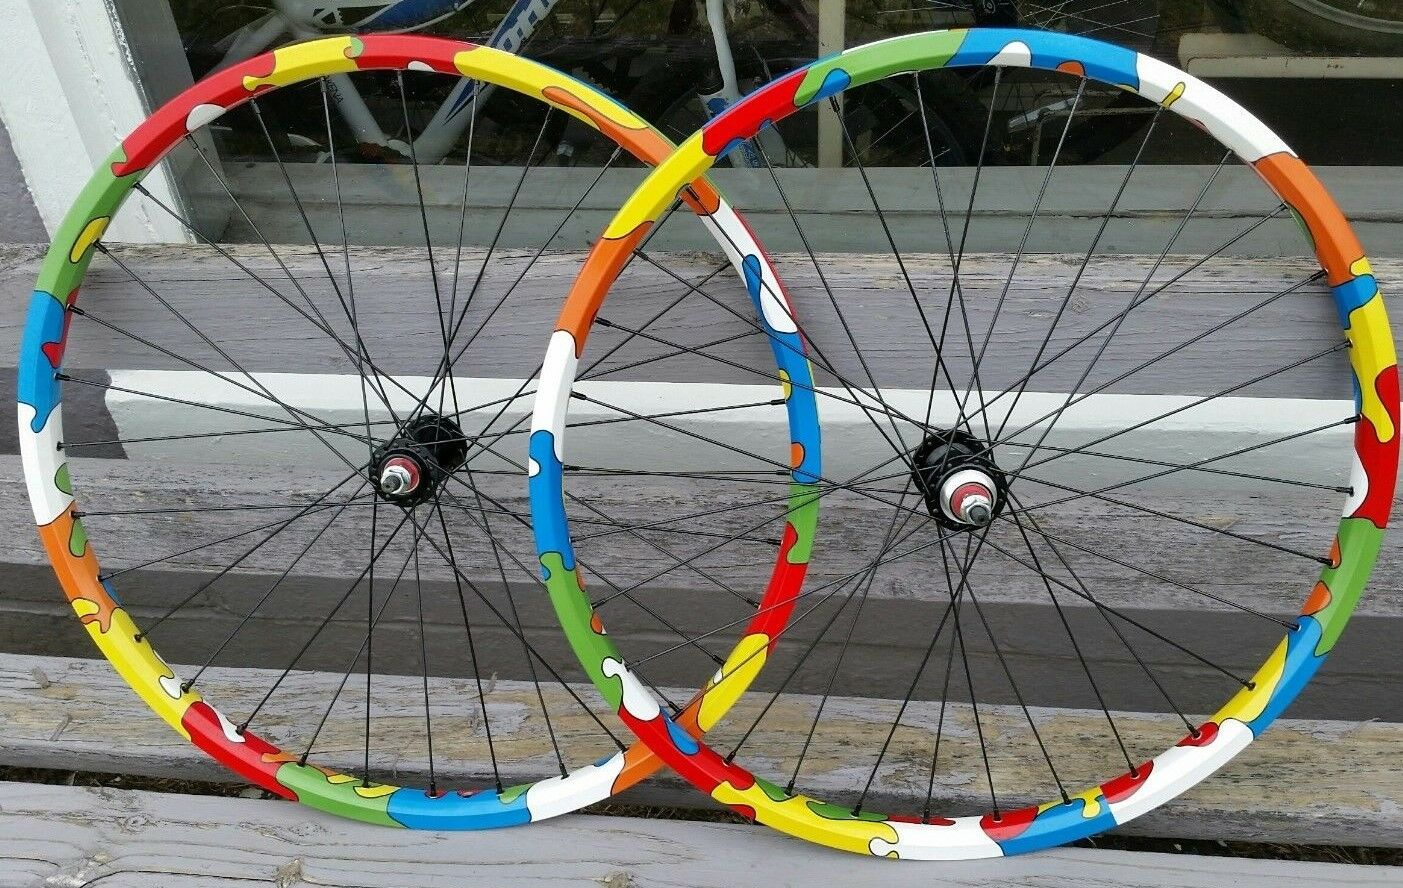 26  Ryde BigBull BMX Wheels Sealed Flip Flop w  Puzzle Design - Pair